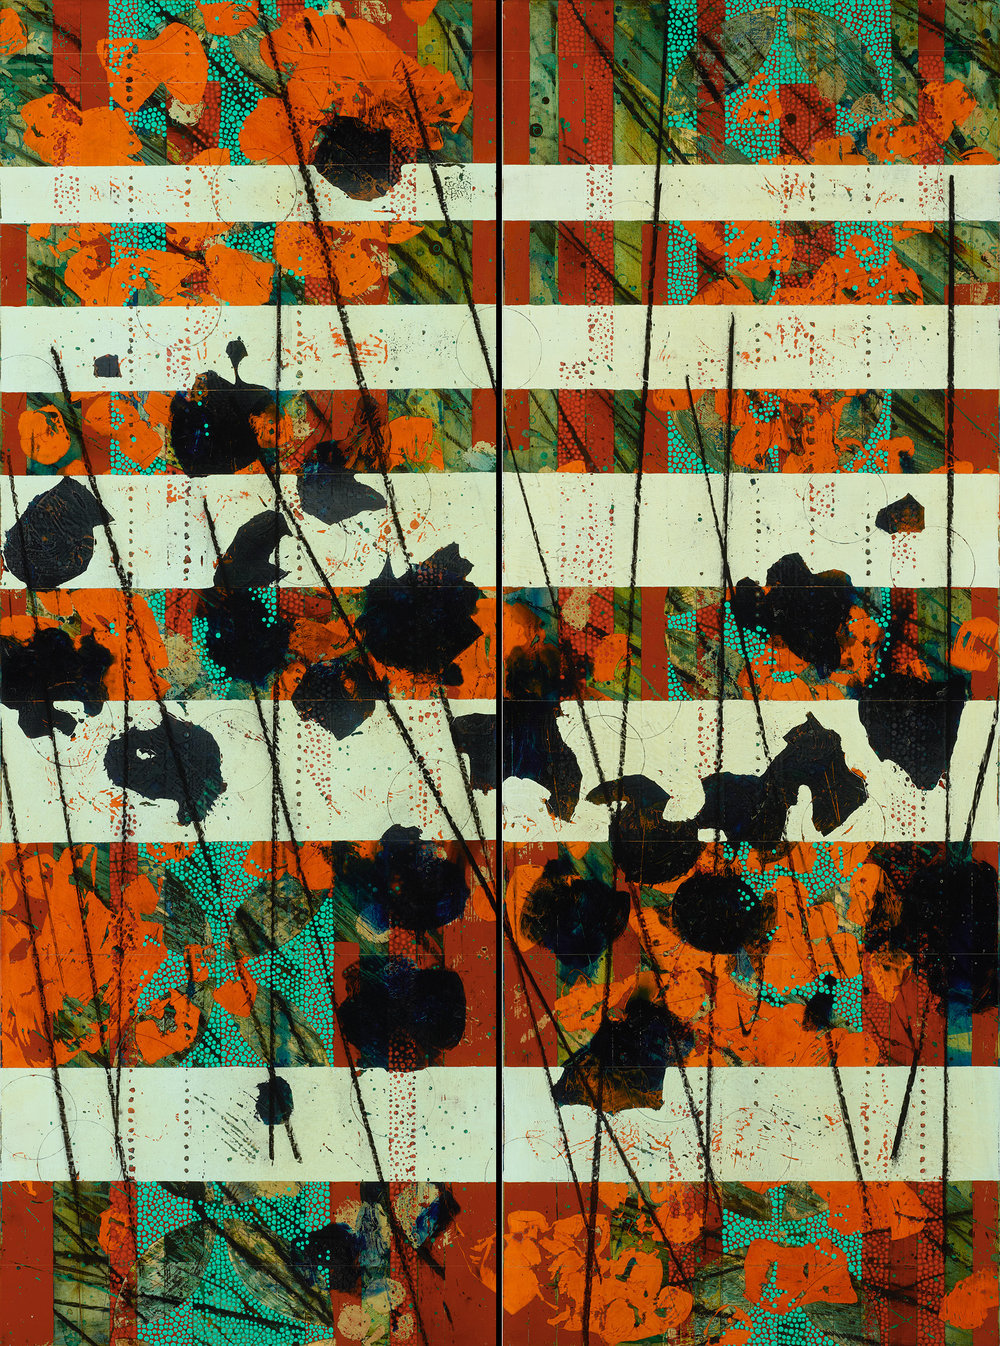 Grass, Slat, Pollen, Poppy